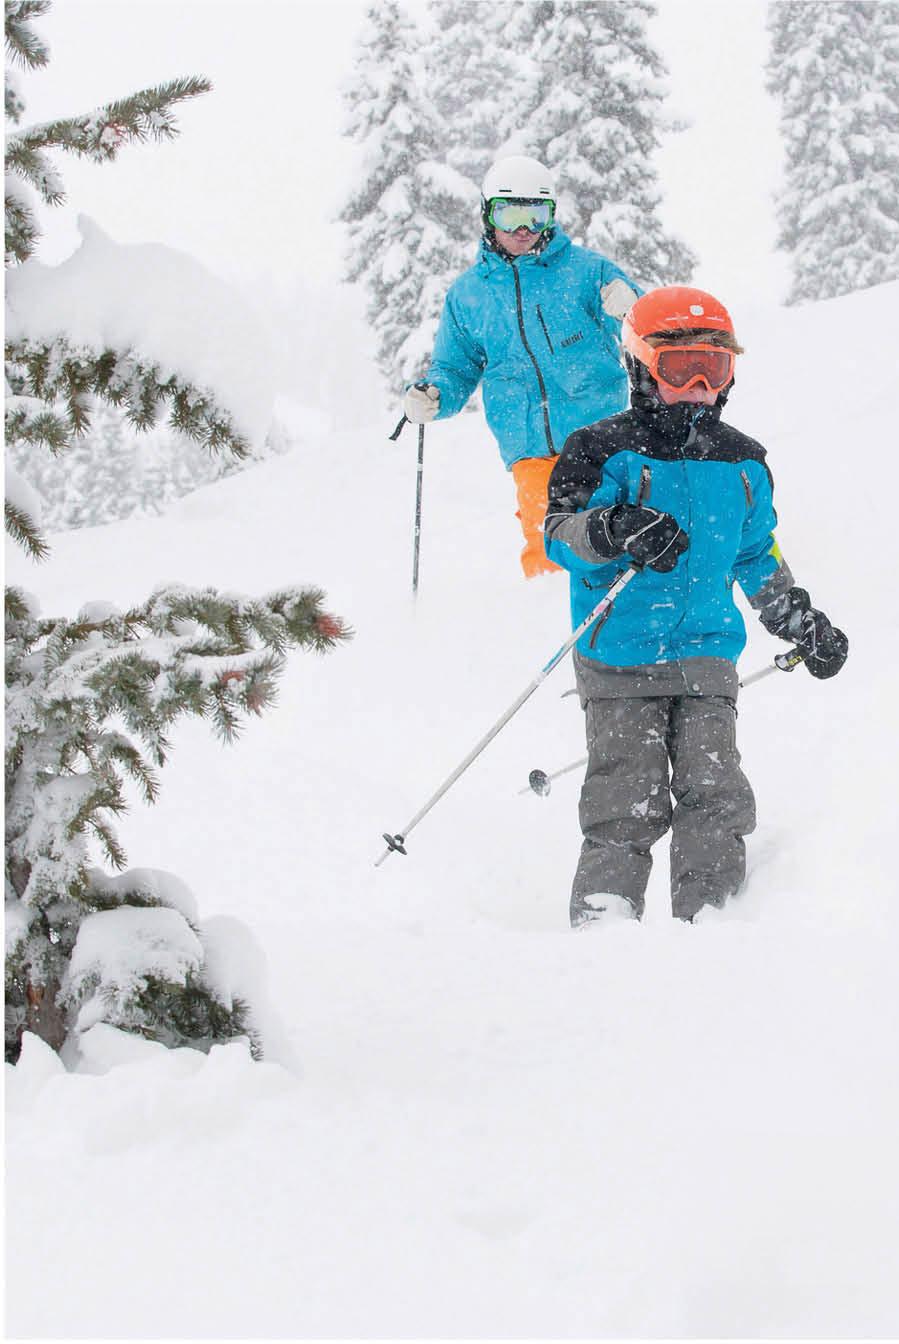 1115 buttermilk kids skiing ei5rvu